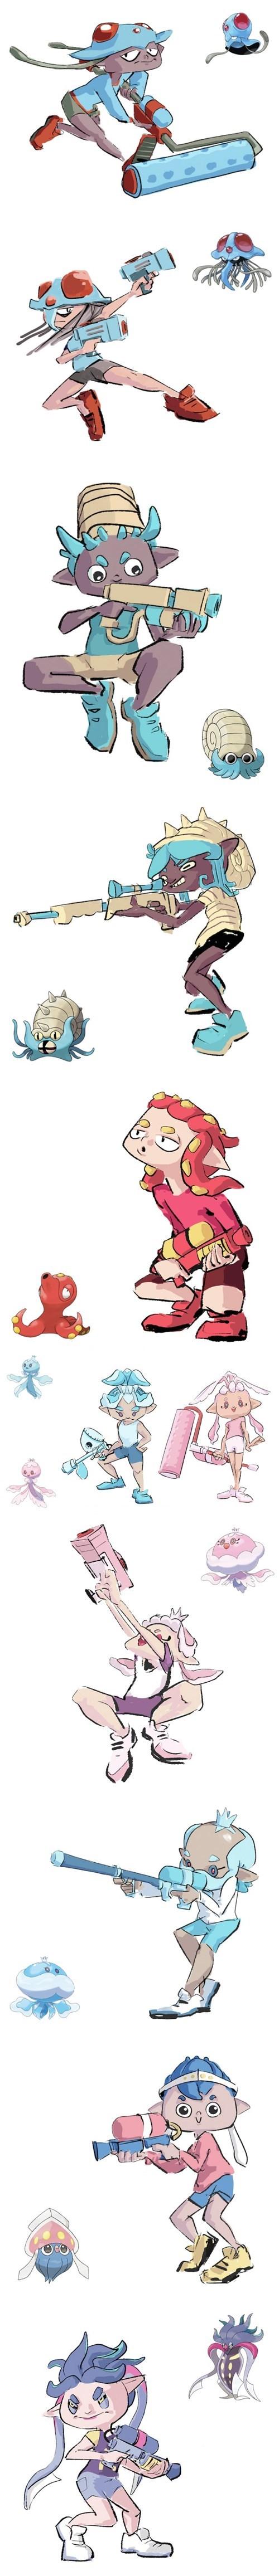 pokemon memes splatoon crossover